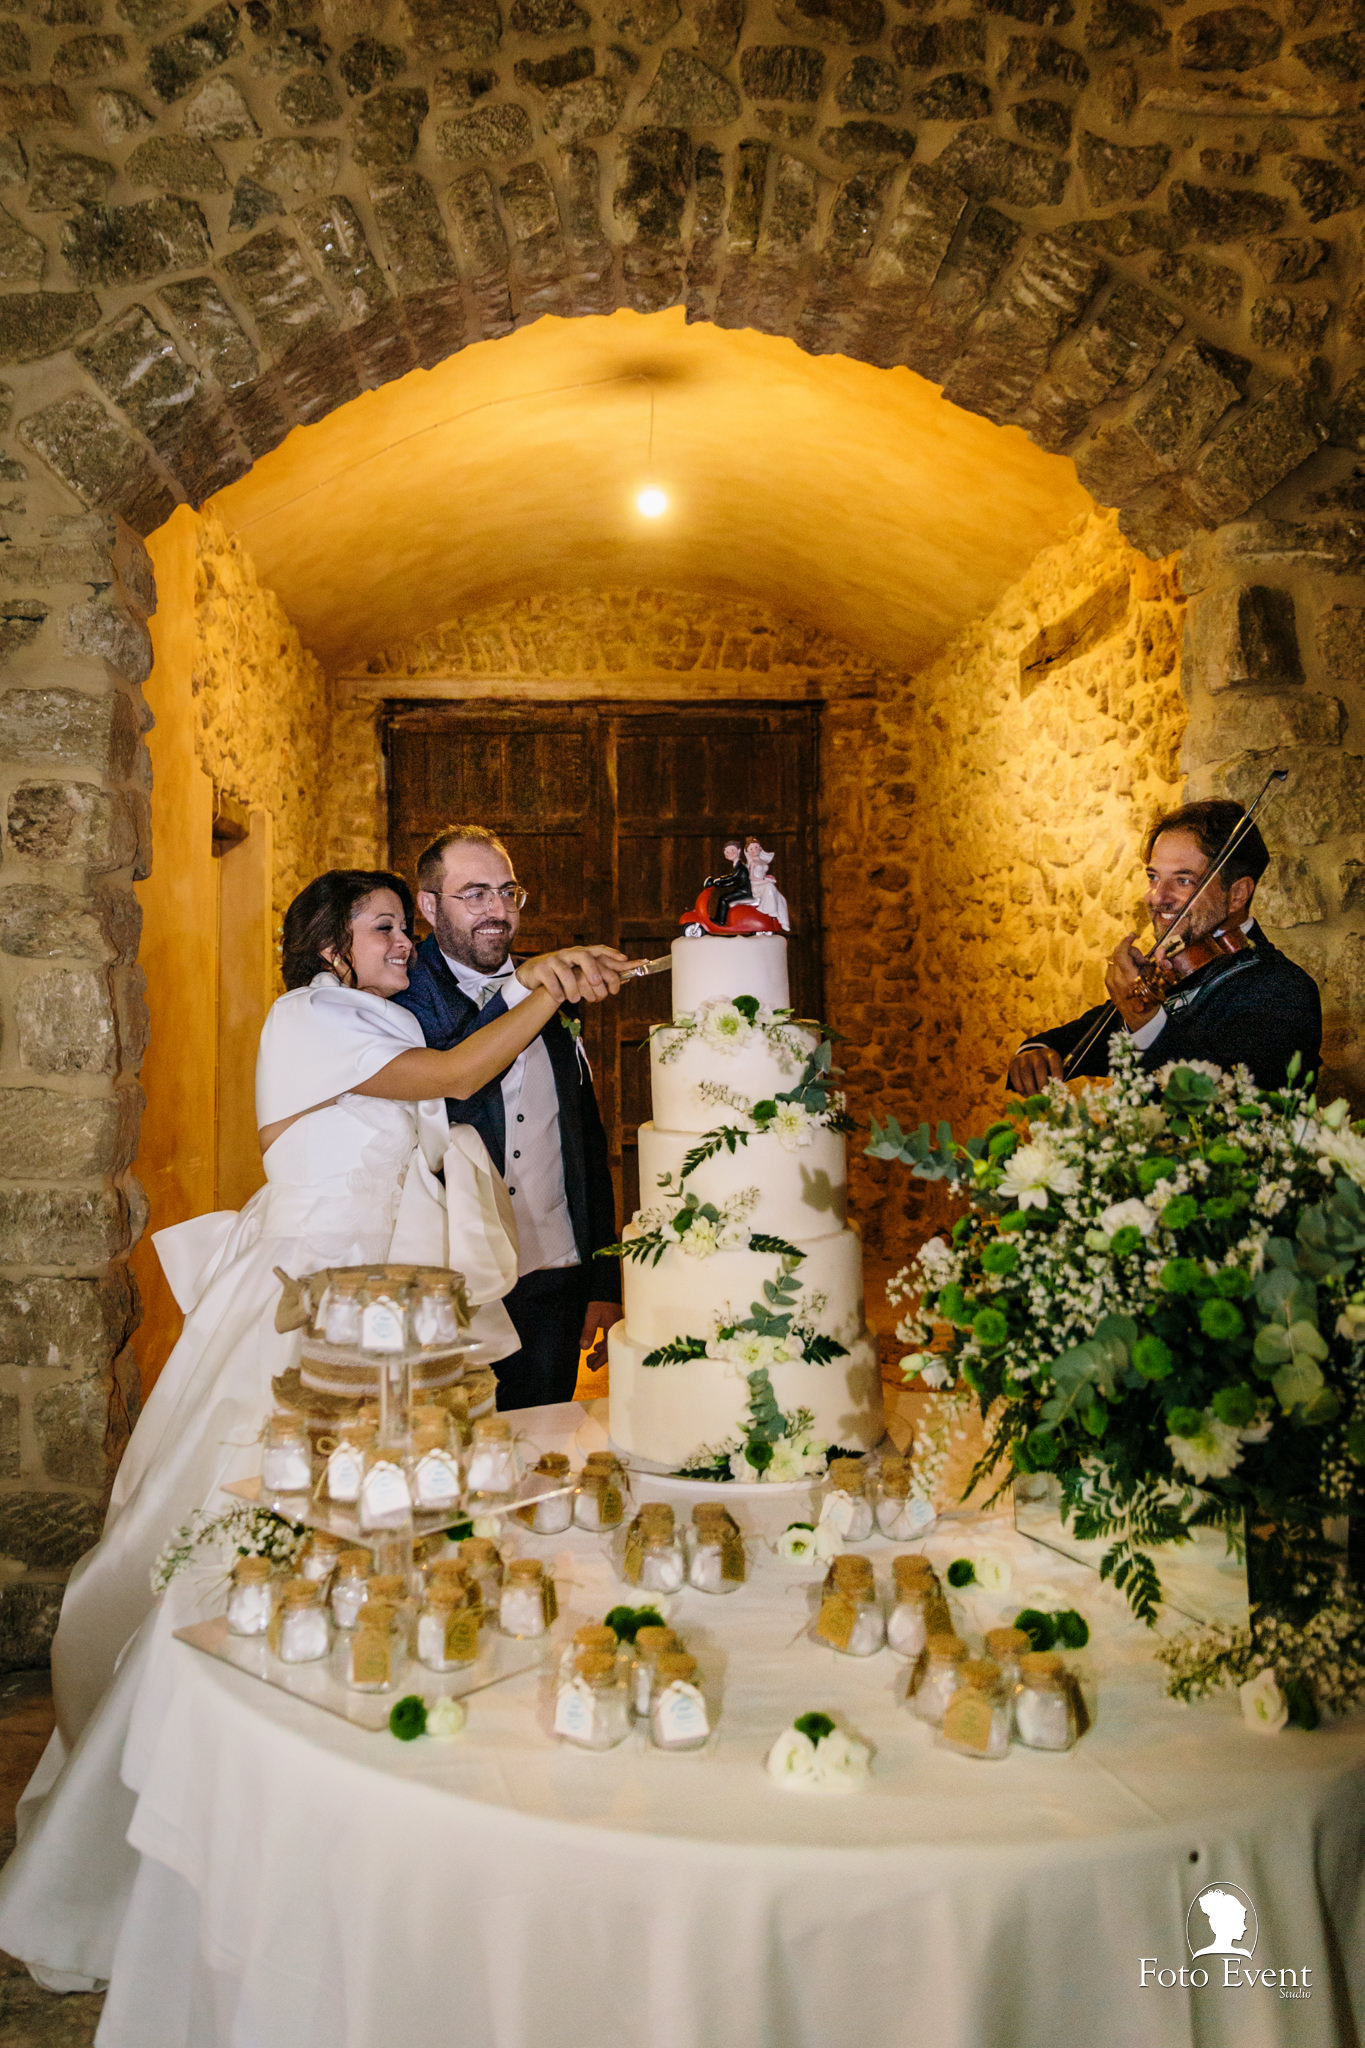 059-2020-10-15-Matrimonio-Noemi-e-Salvatore-Paterno-5DE-2650-Edit